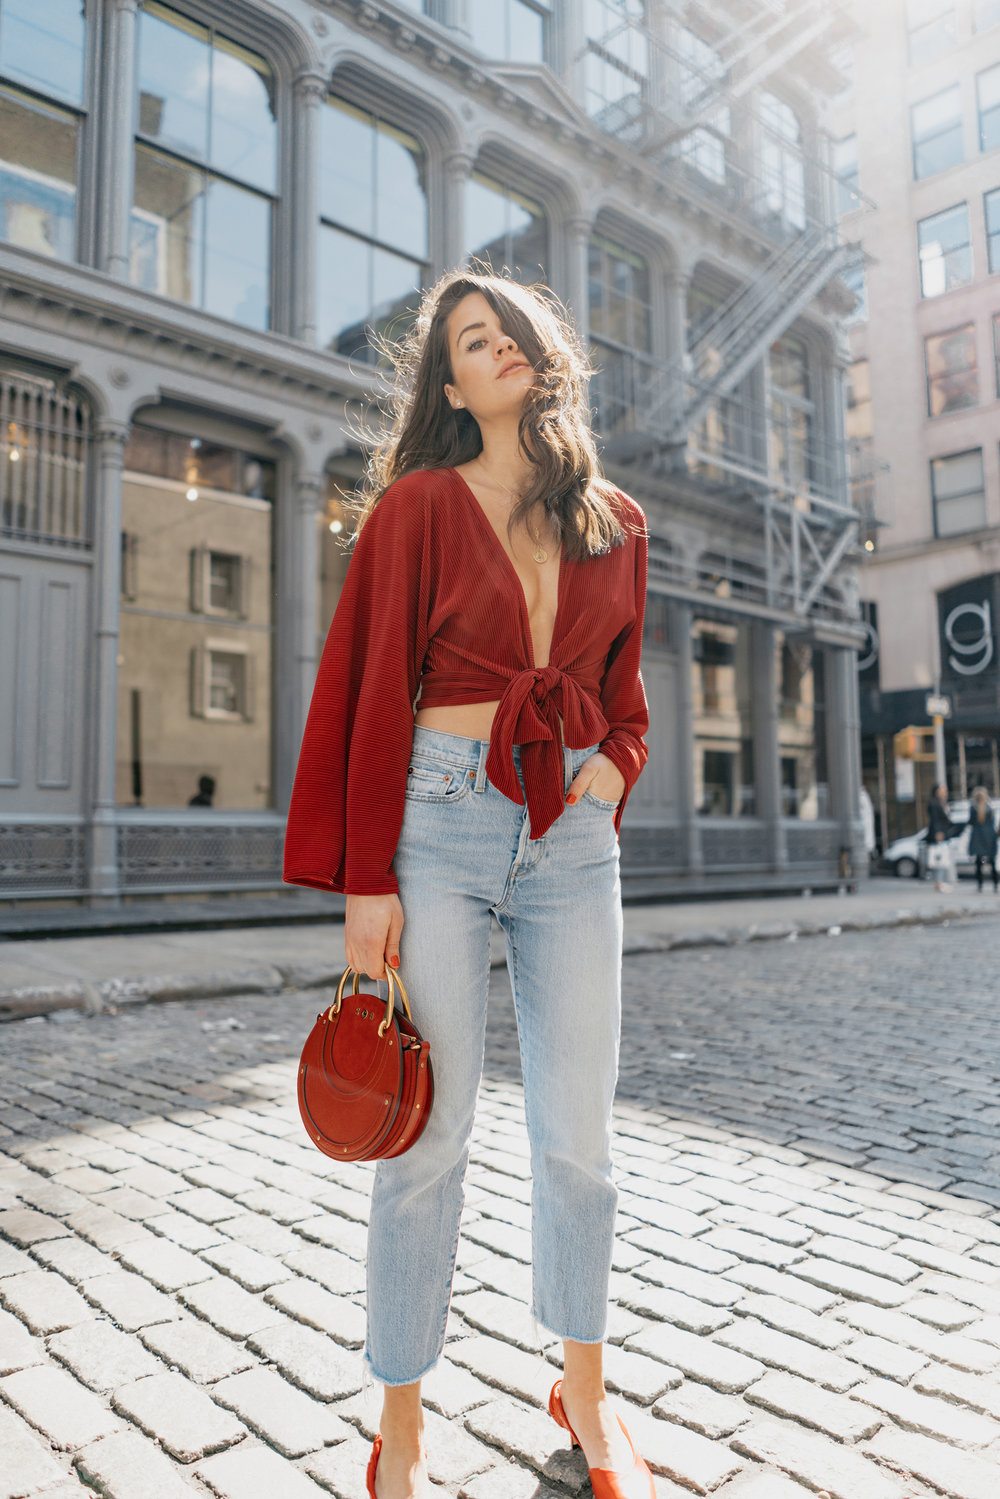 Red-Kimono-Tie-Front-Top-Ruby-Chloe-Pixie-Leather-Crossbody-Bag-4.jpg